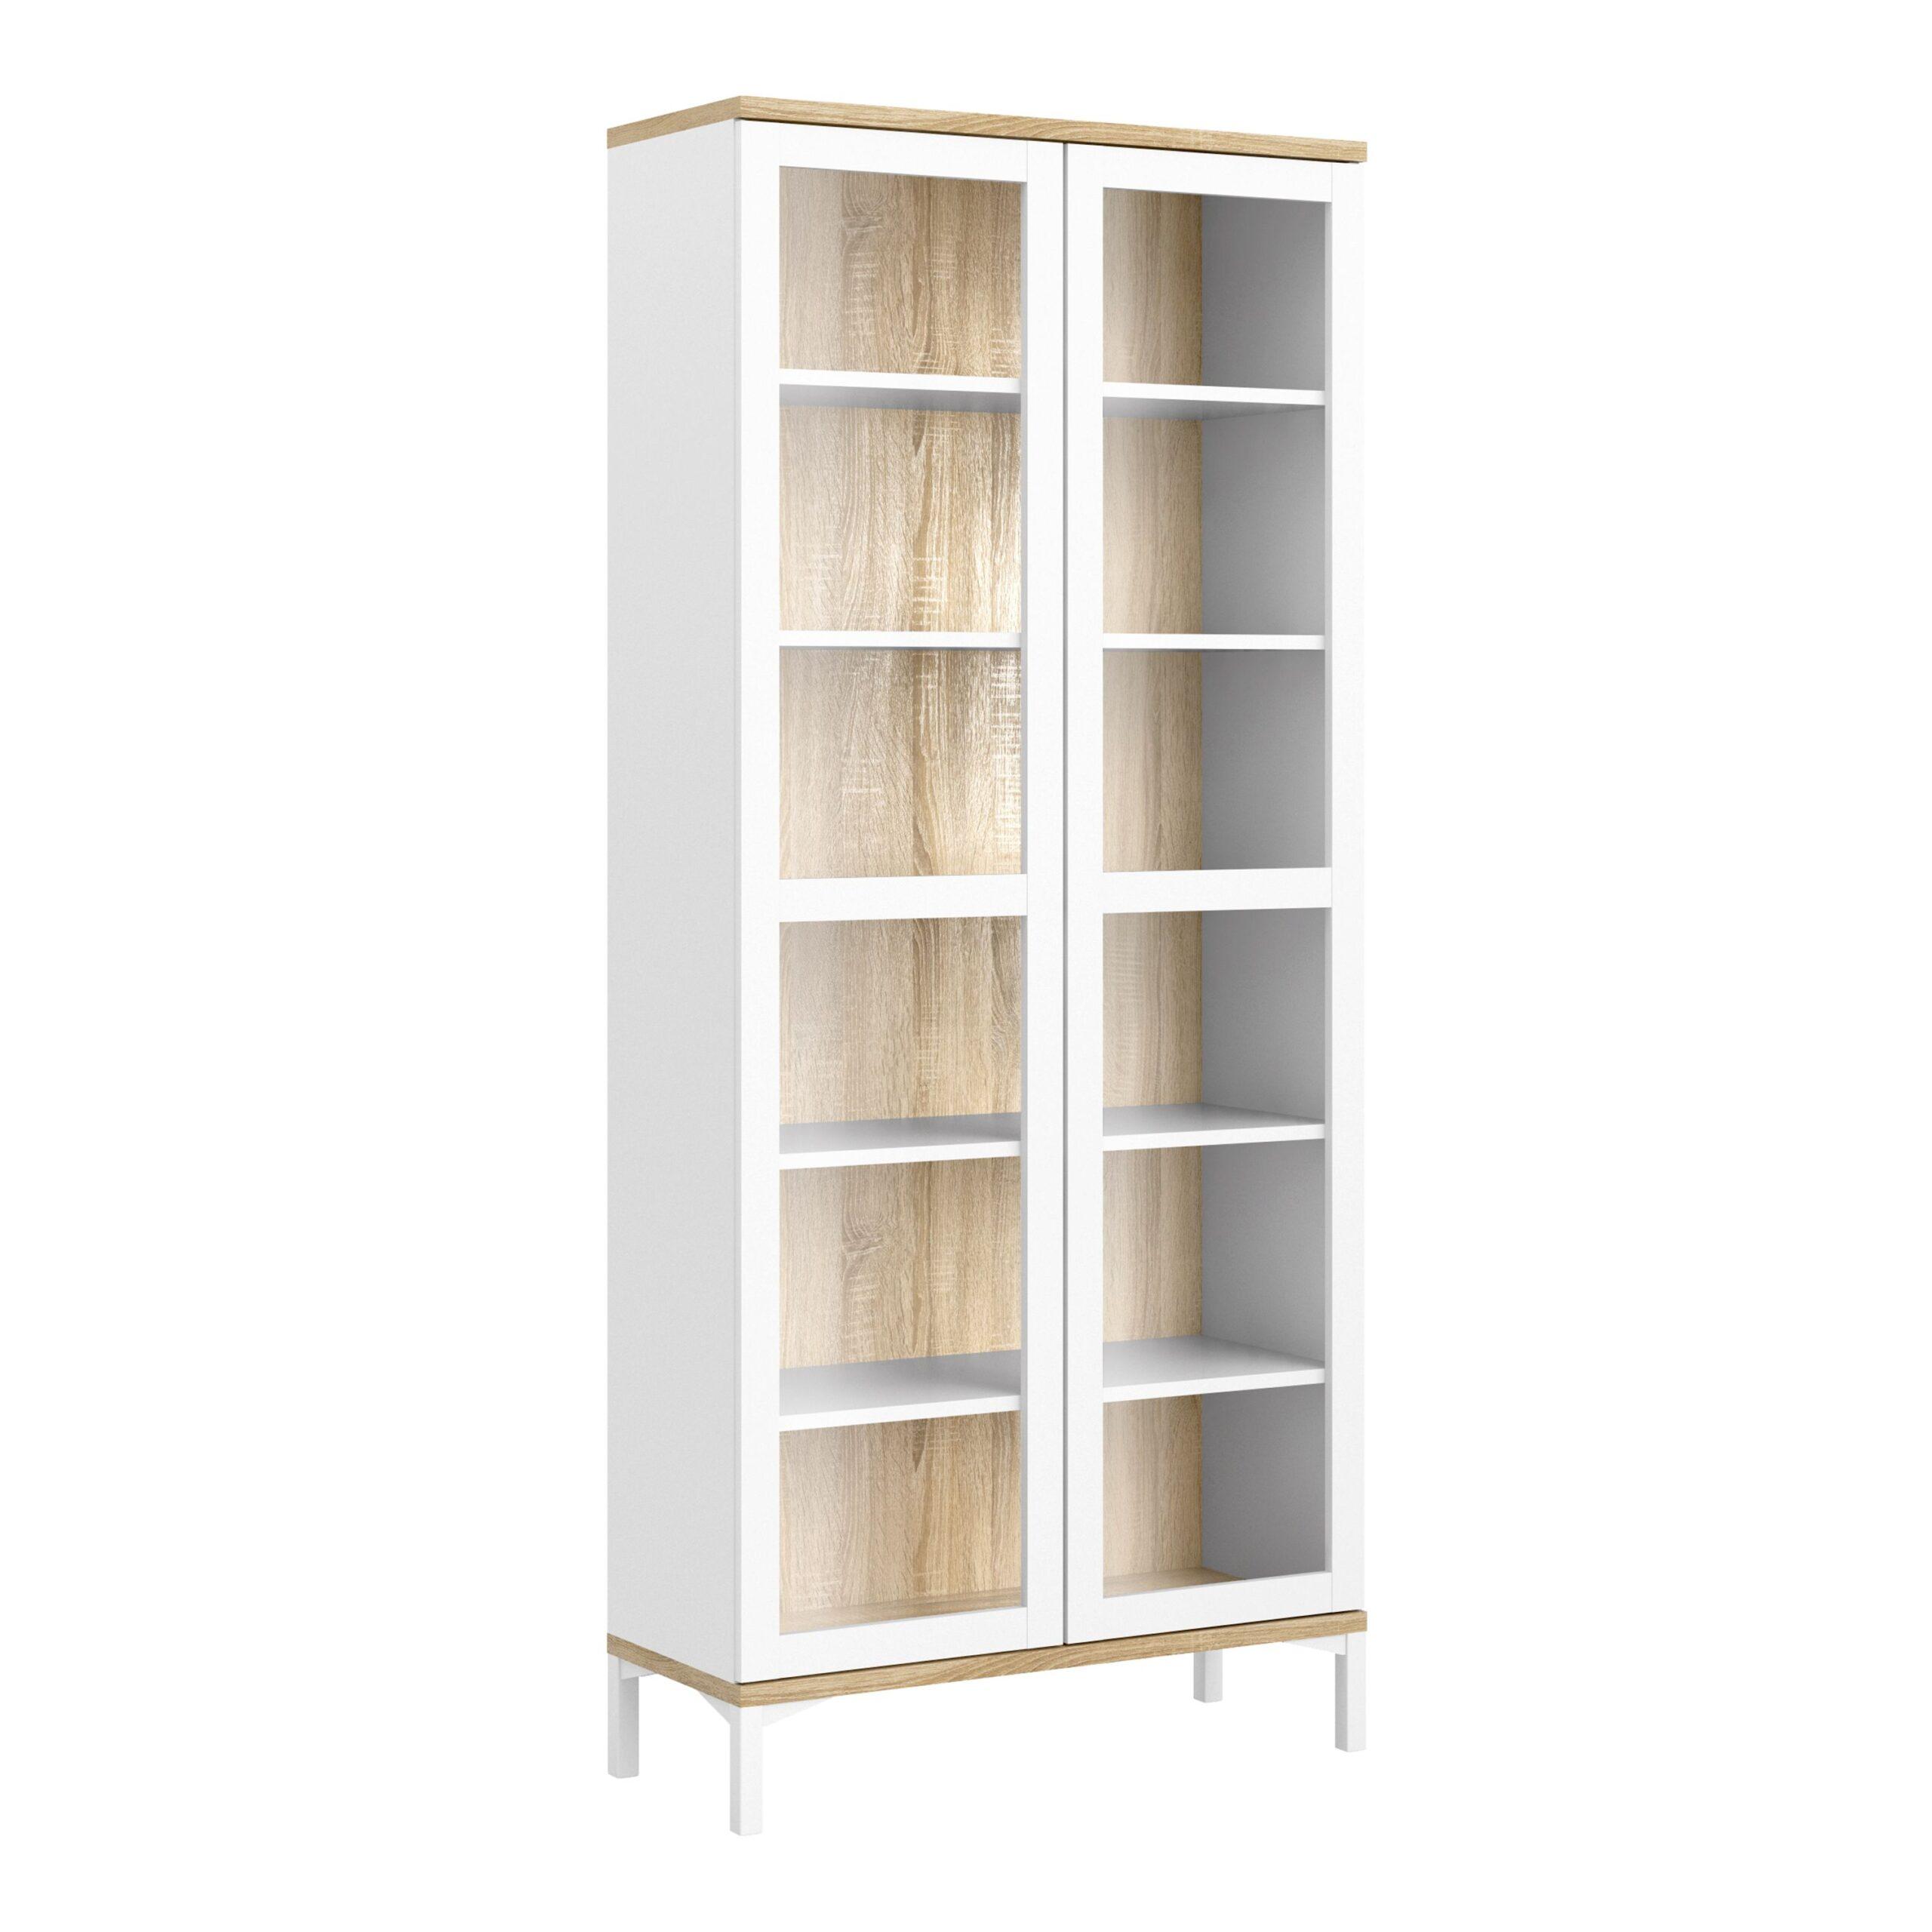 Ramen Display Cabinet Glazed 2 Doors in White and Oak